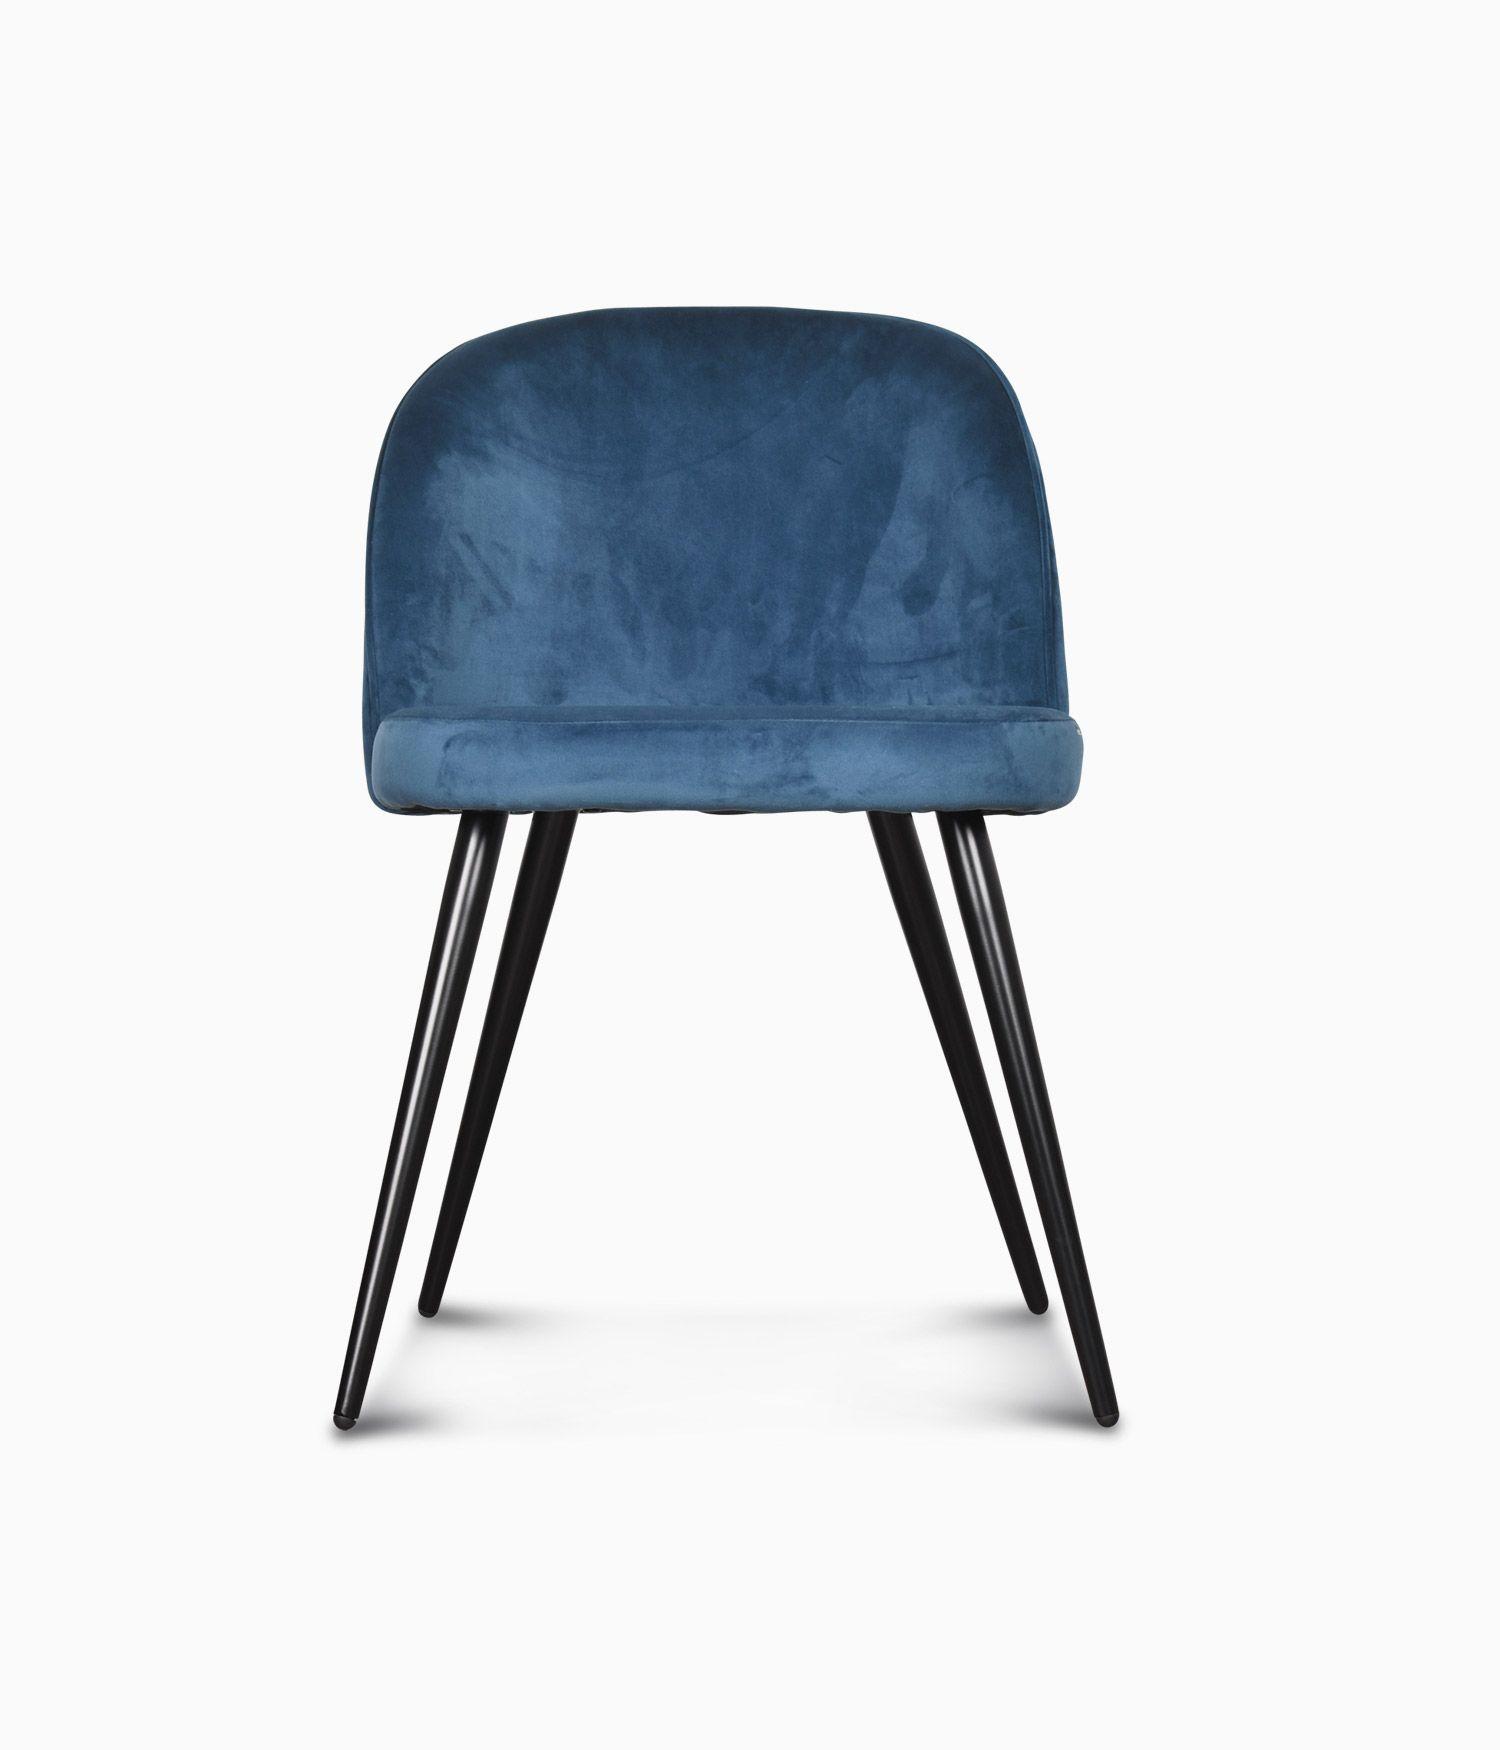 Chaise Ingrid en velours - Bleu canard